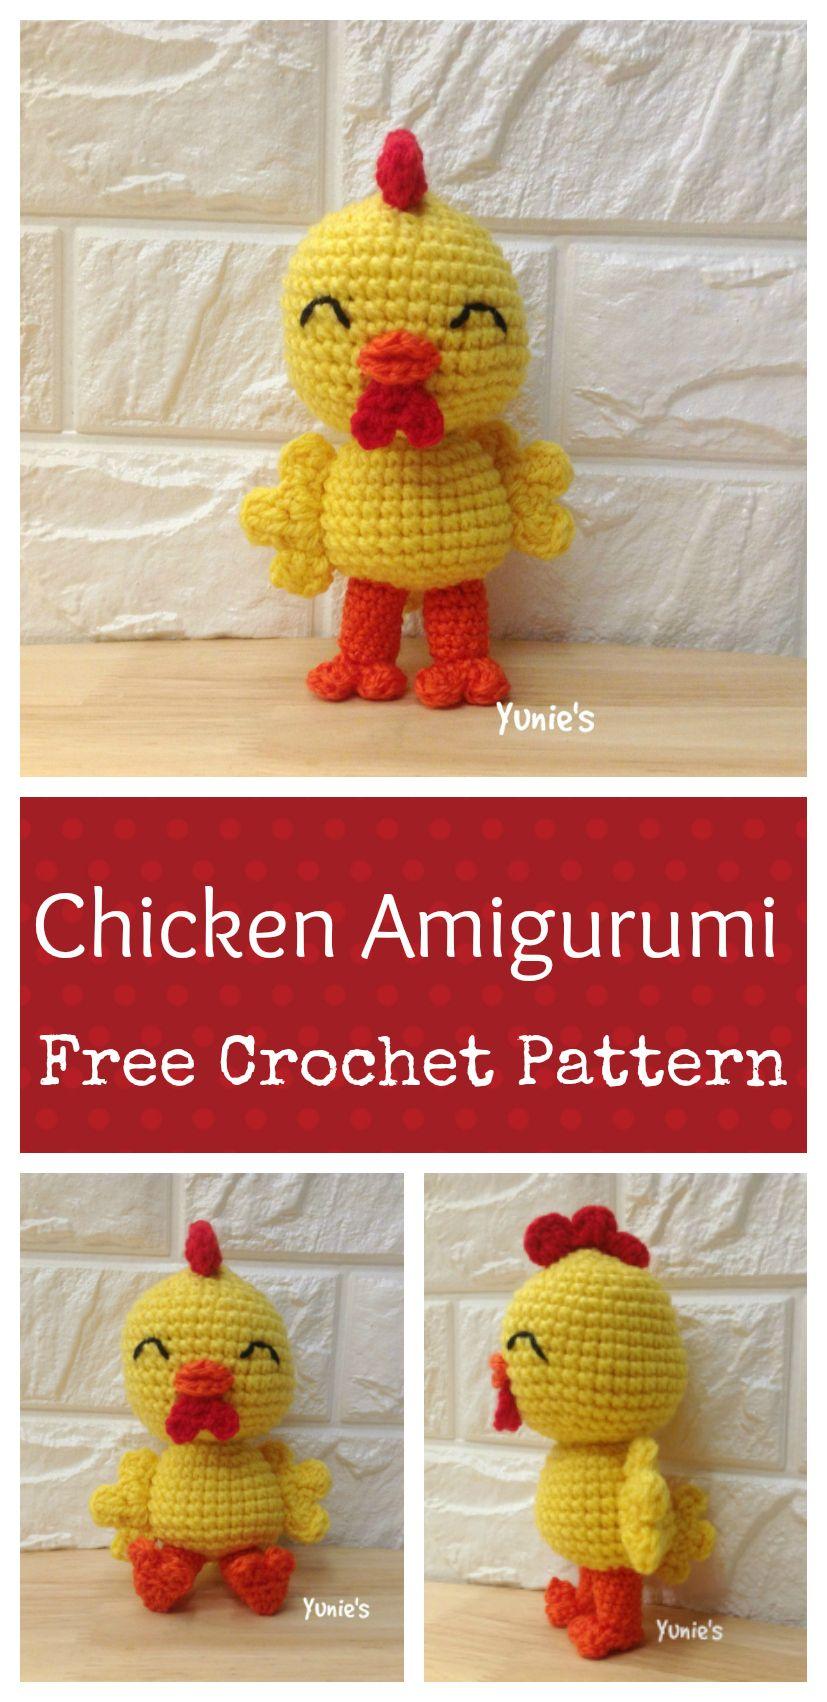 Free crochet pattern : Chicken Amigurumi   crochet   Pinterest ...